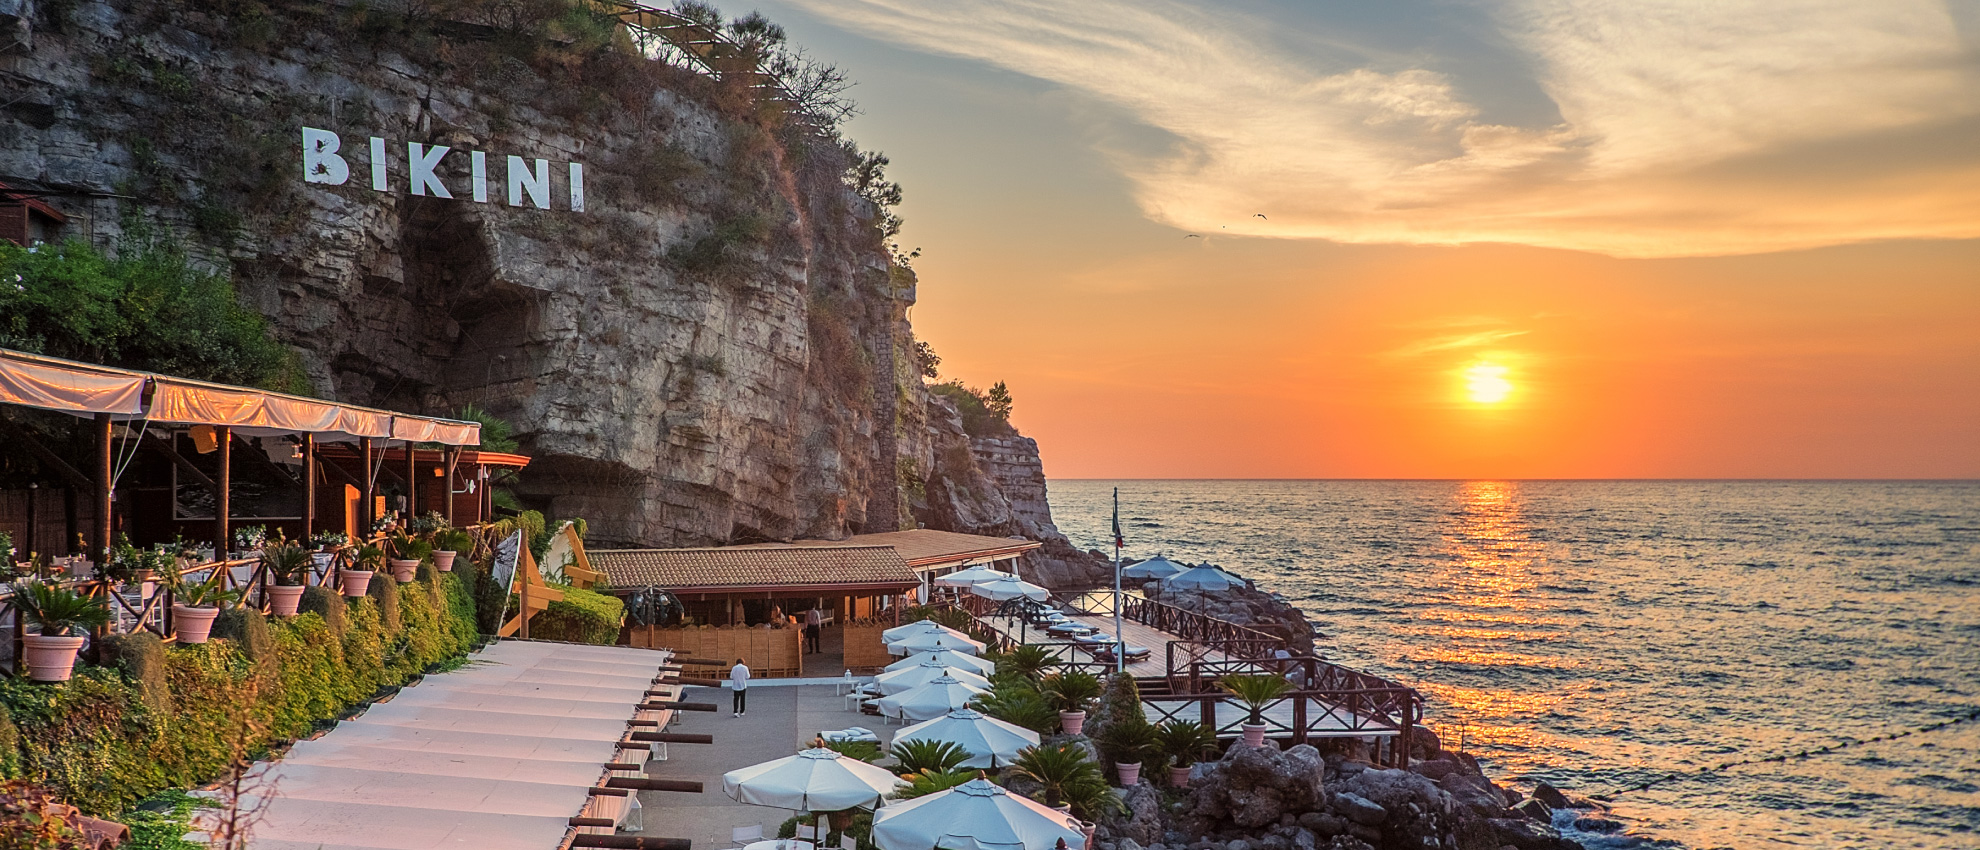 Il Bikini Vico Equense Beach Club Restaurant Events Wedding